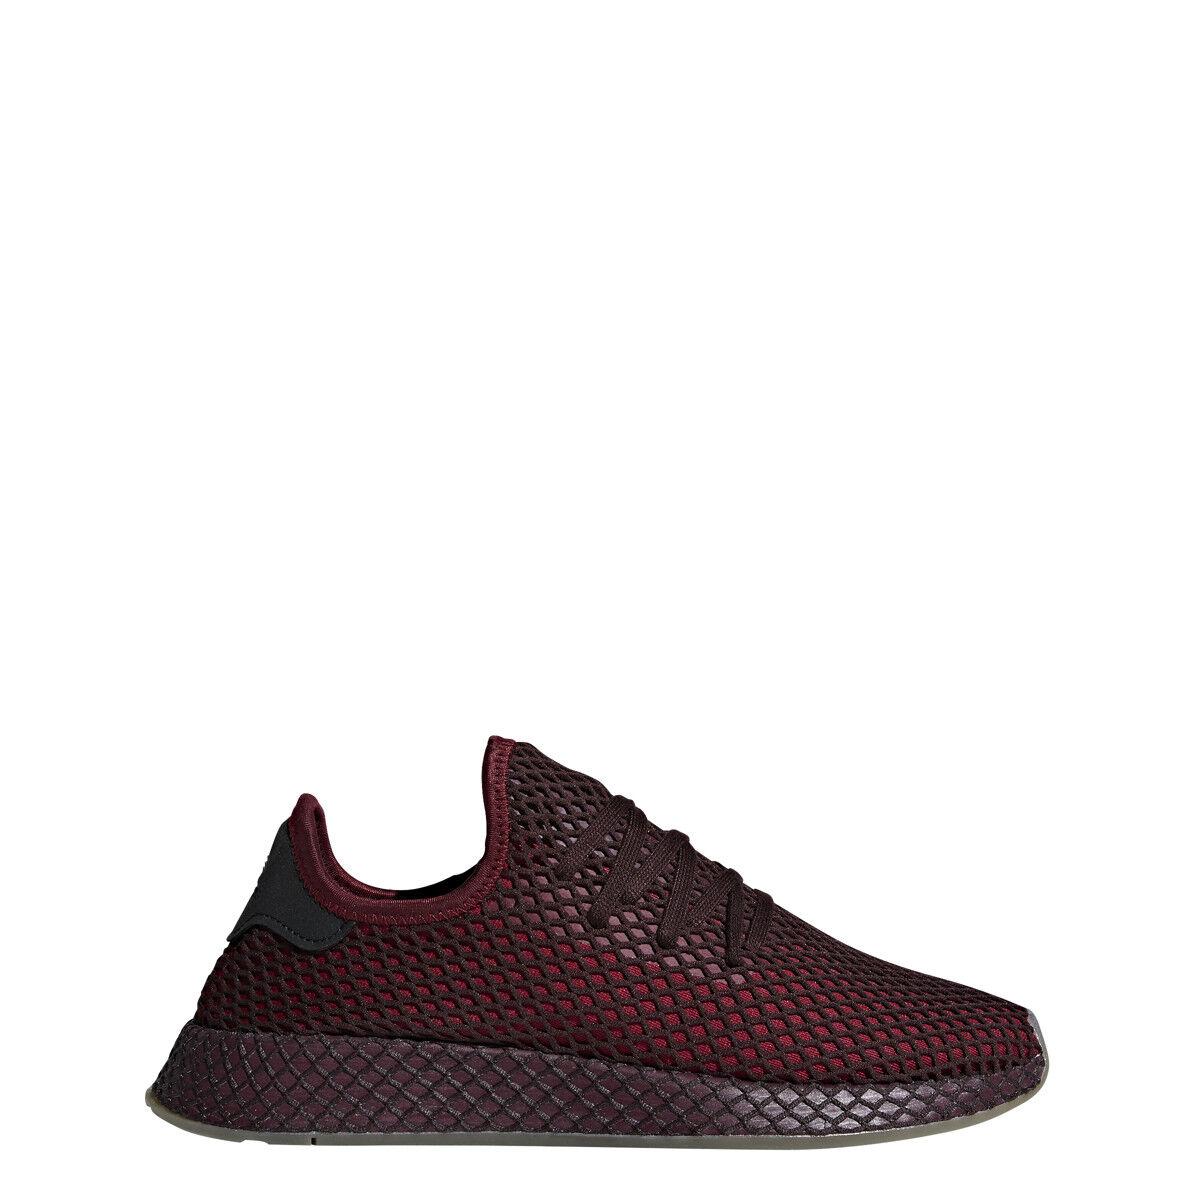 Adidas Mens DEERUPT RUNNER Burgundy Burgundy Green - B41773